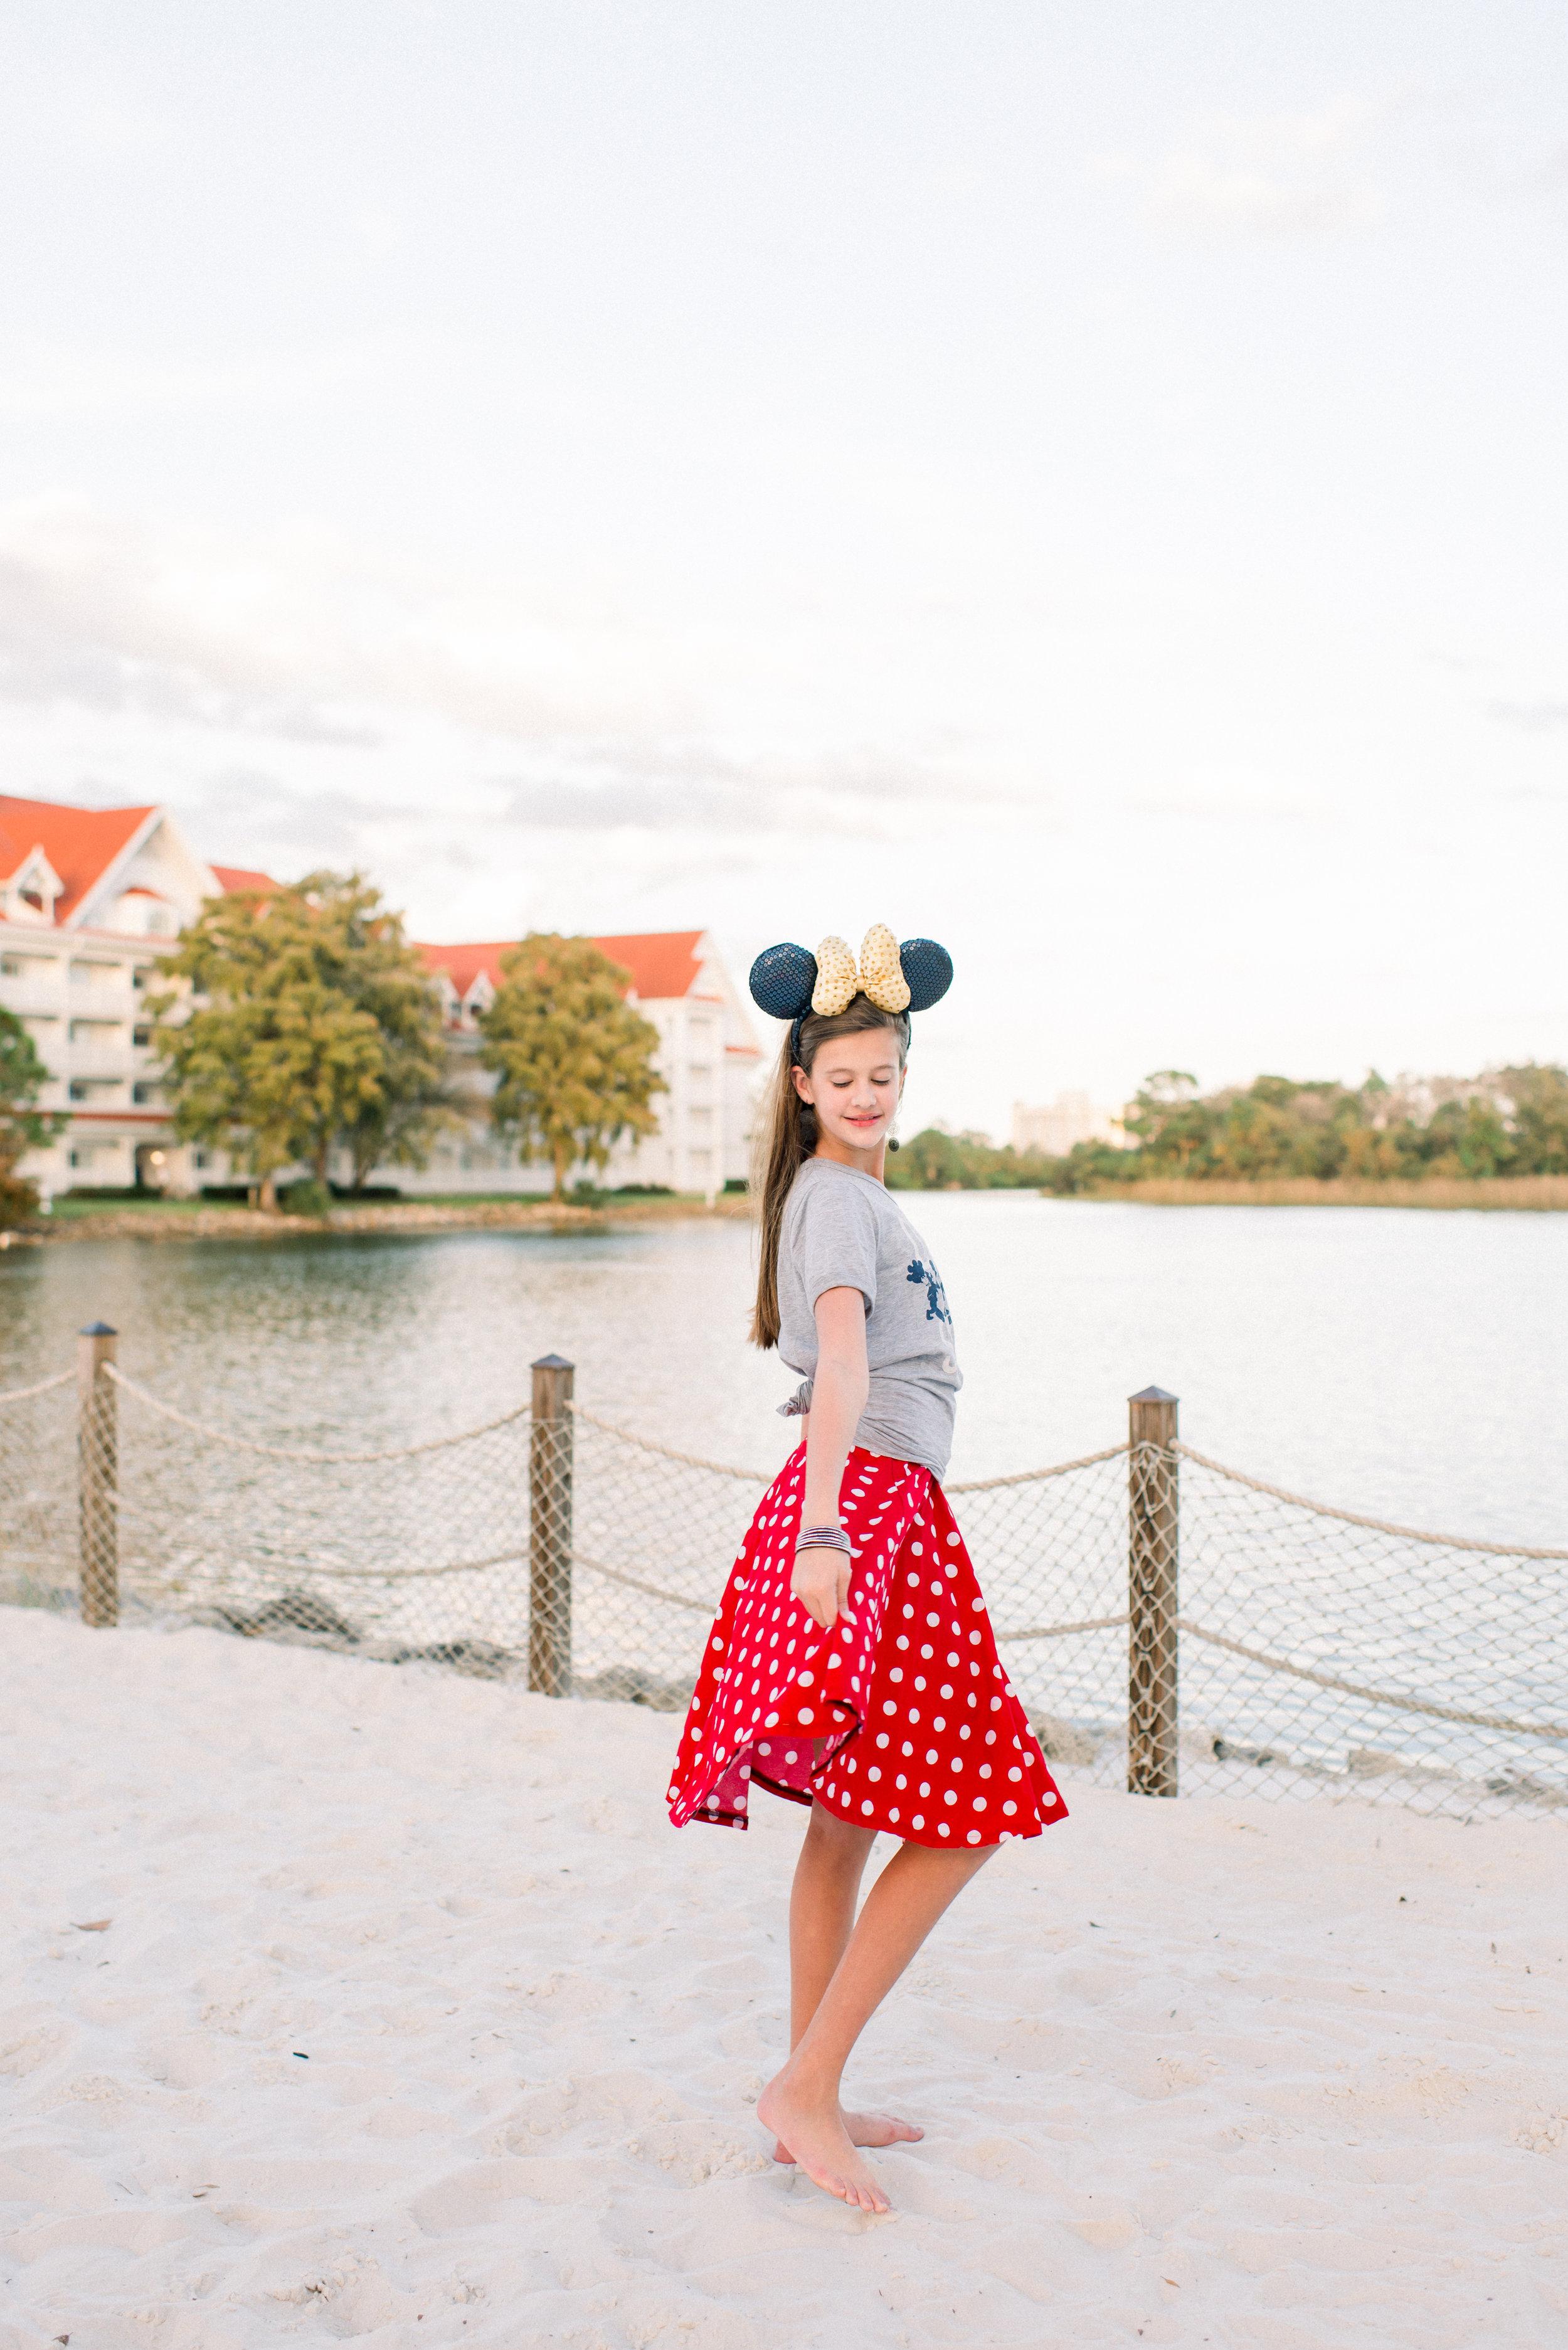 KateTaramykinStudios-Disney-Grand-Floridian-Family-Portraits-Kulwicki-23.jpg